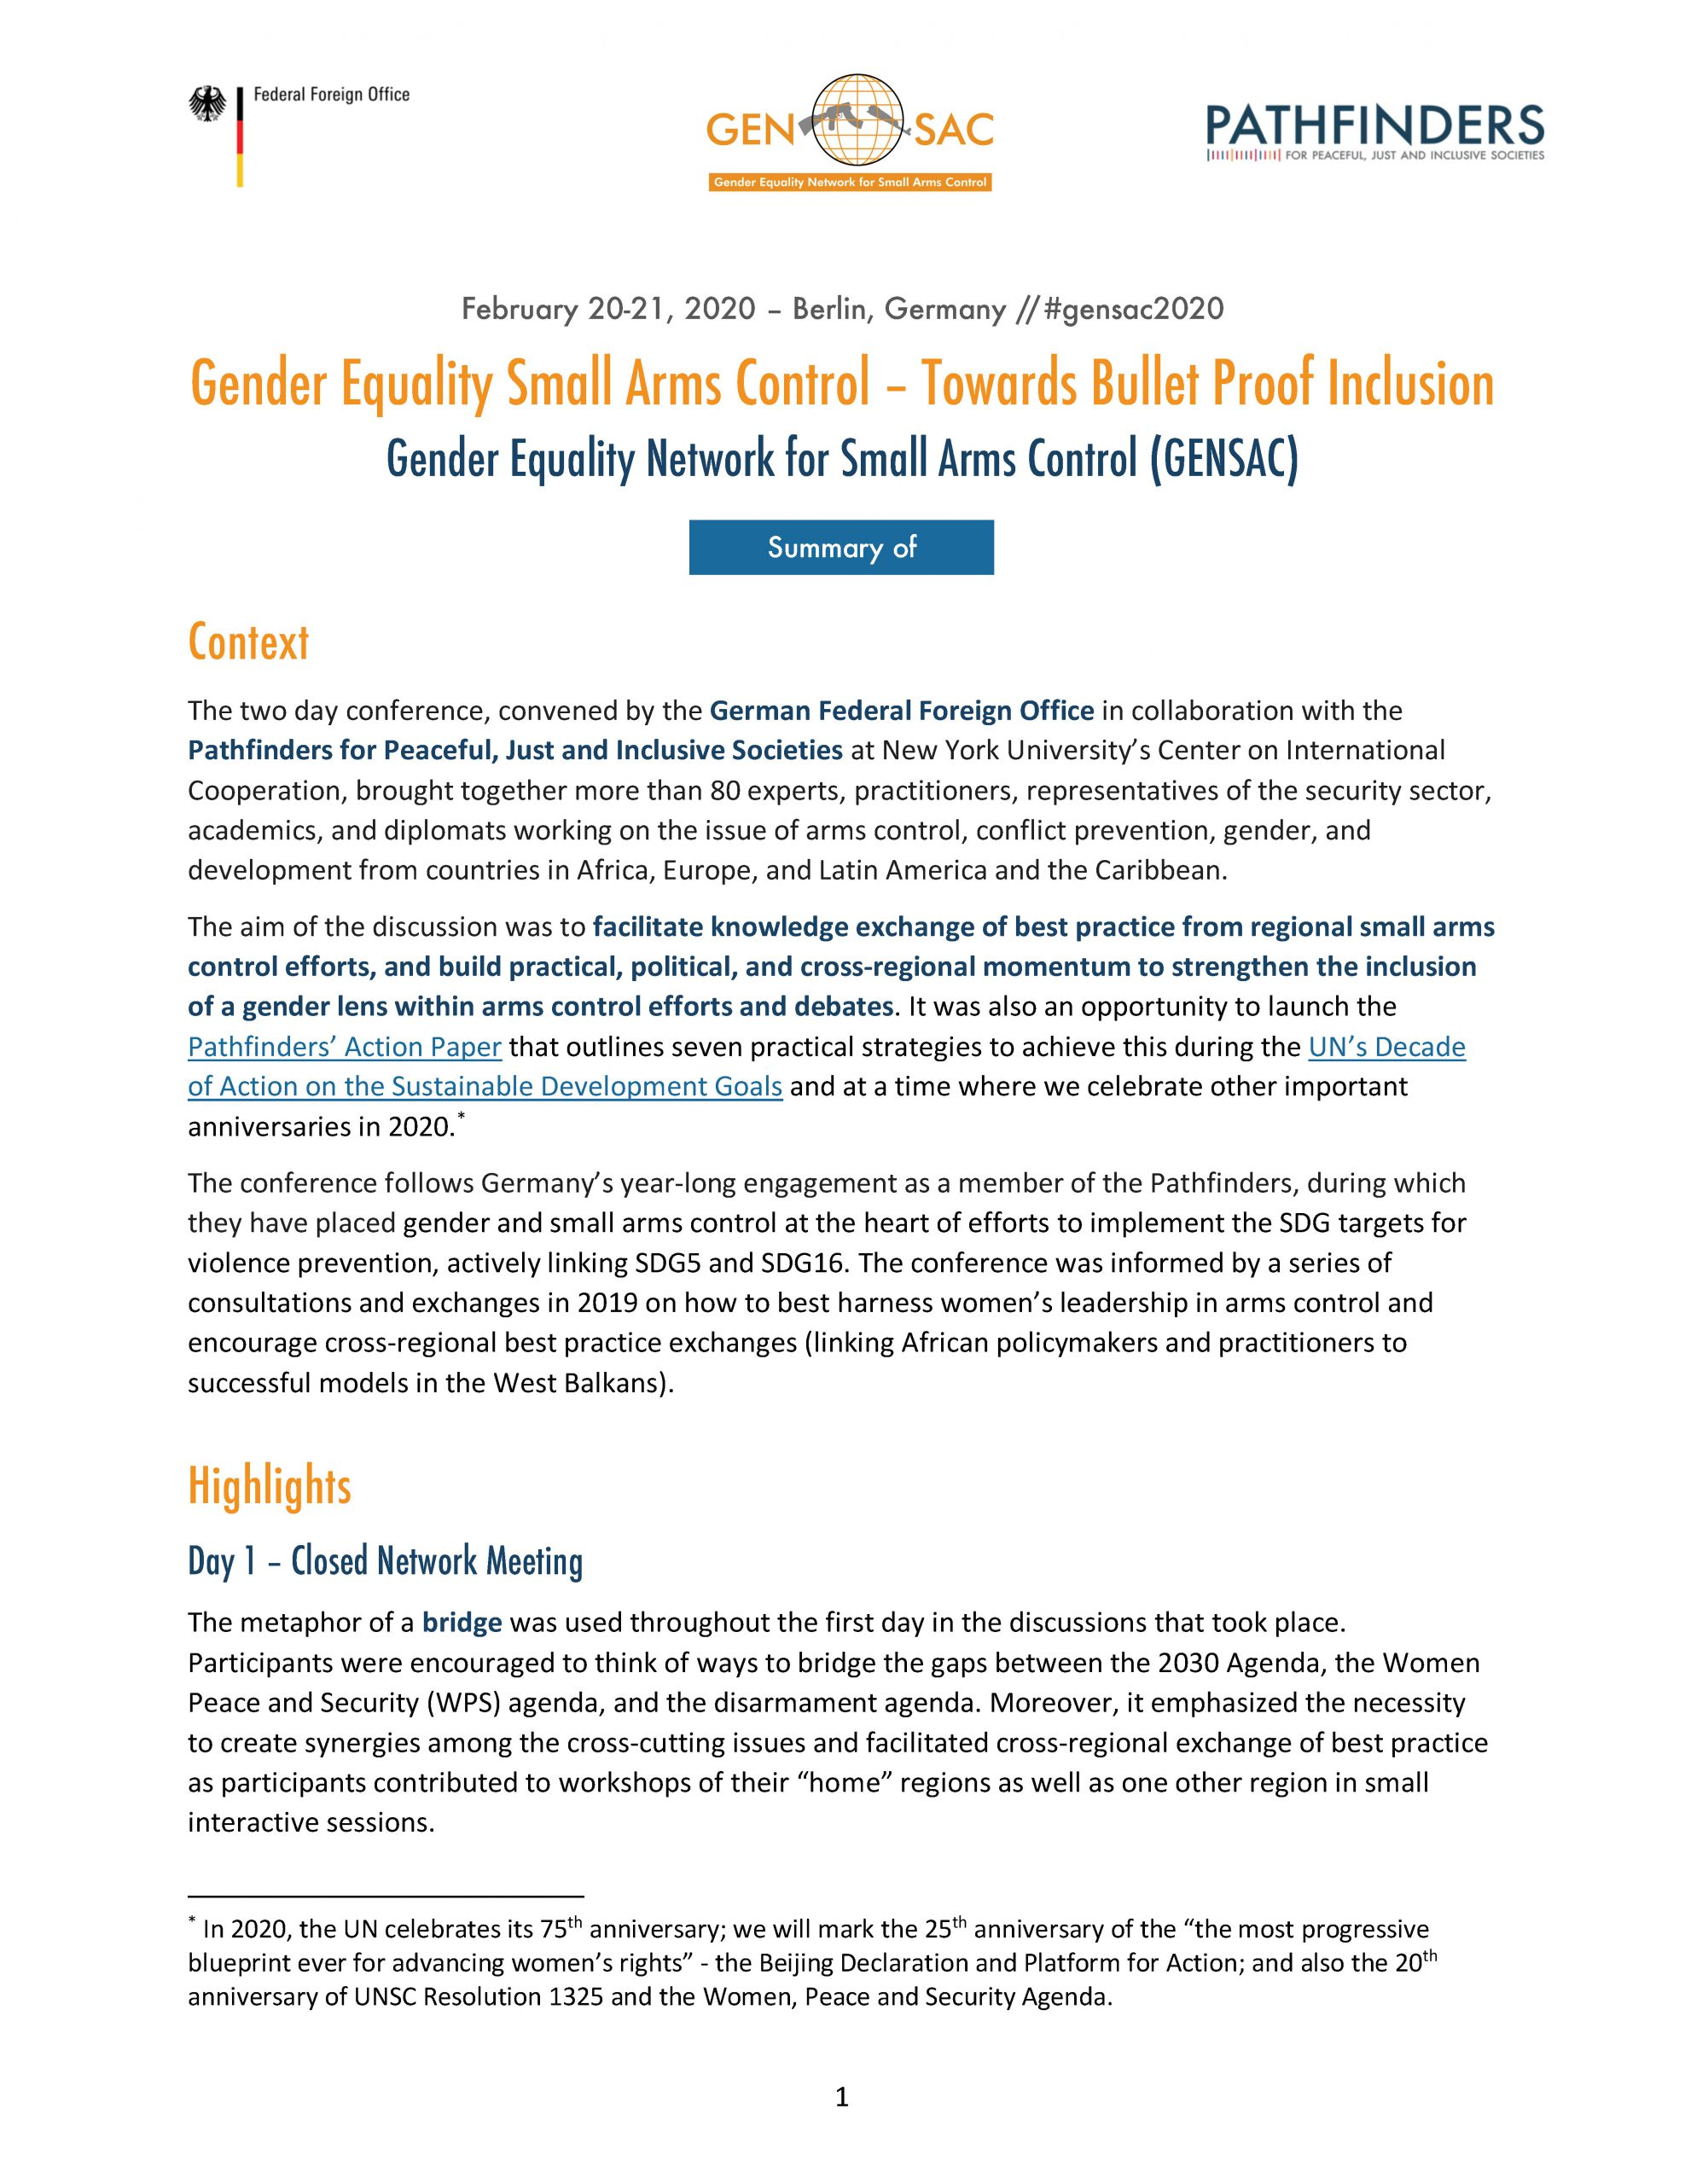 GENSAC 2020 Summary_final_EN_Cover